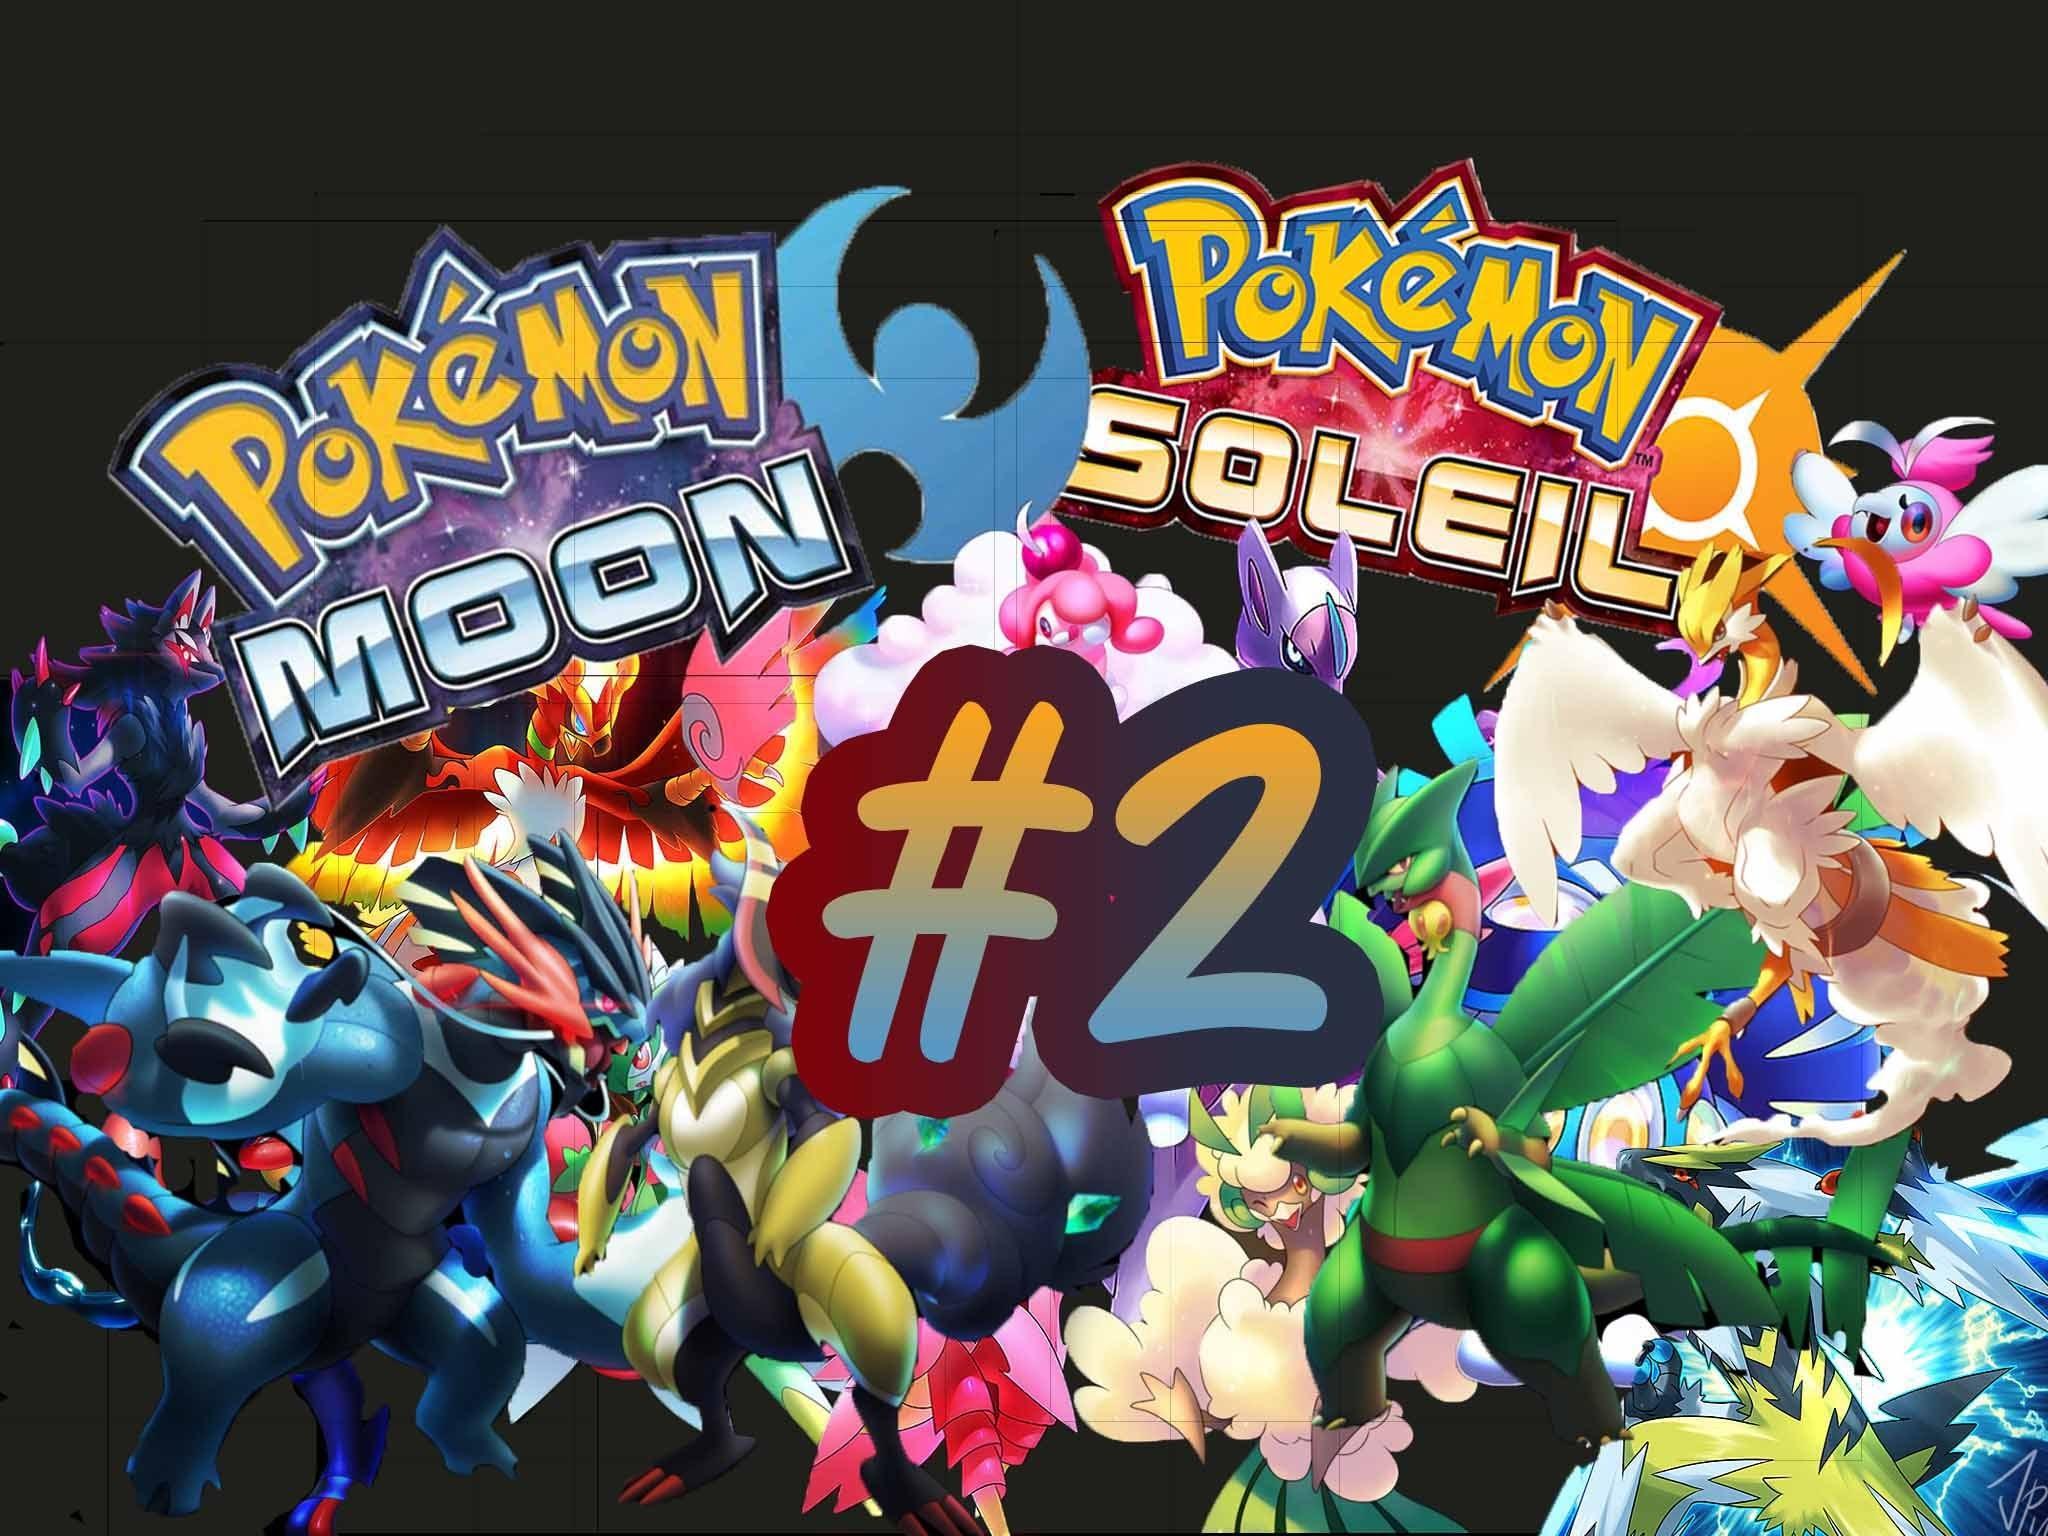 TOP 30 POKEMON FUSION #2 [POKEMON ULTRA MOON & SUN – LUNE & SOLEIL] POKEMON  FUSIONS THEORIE – YouTube